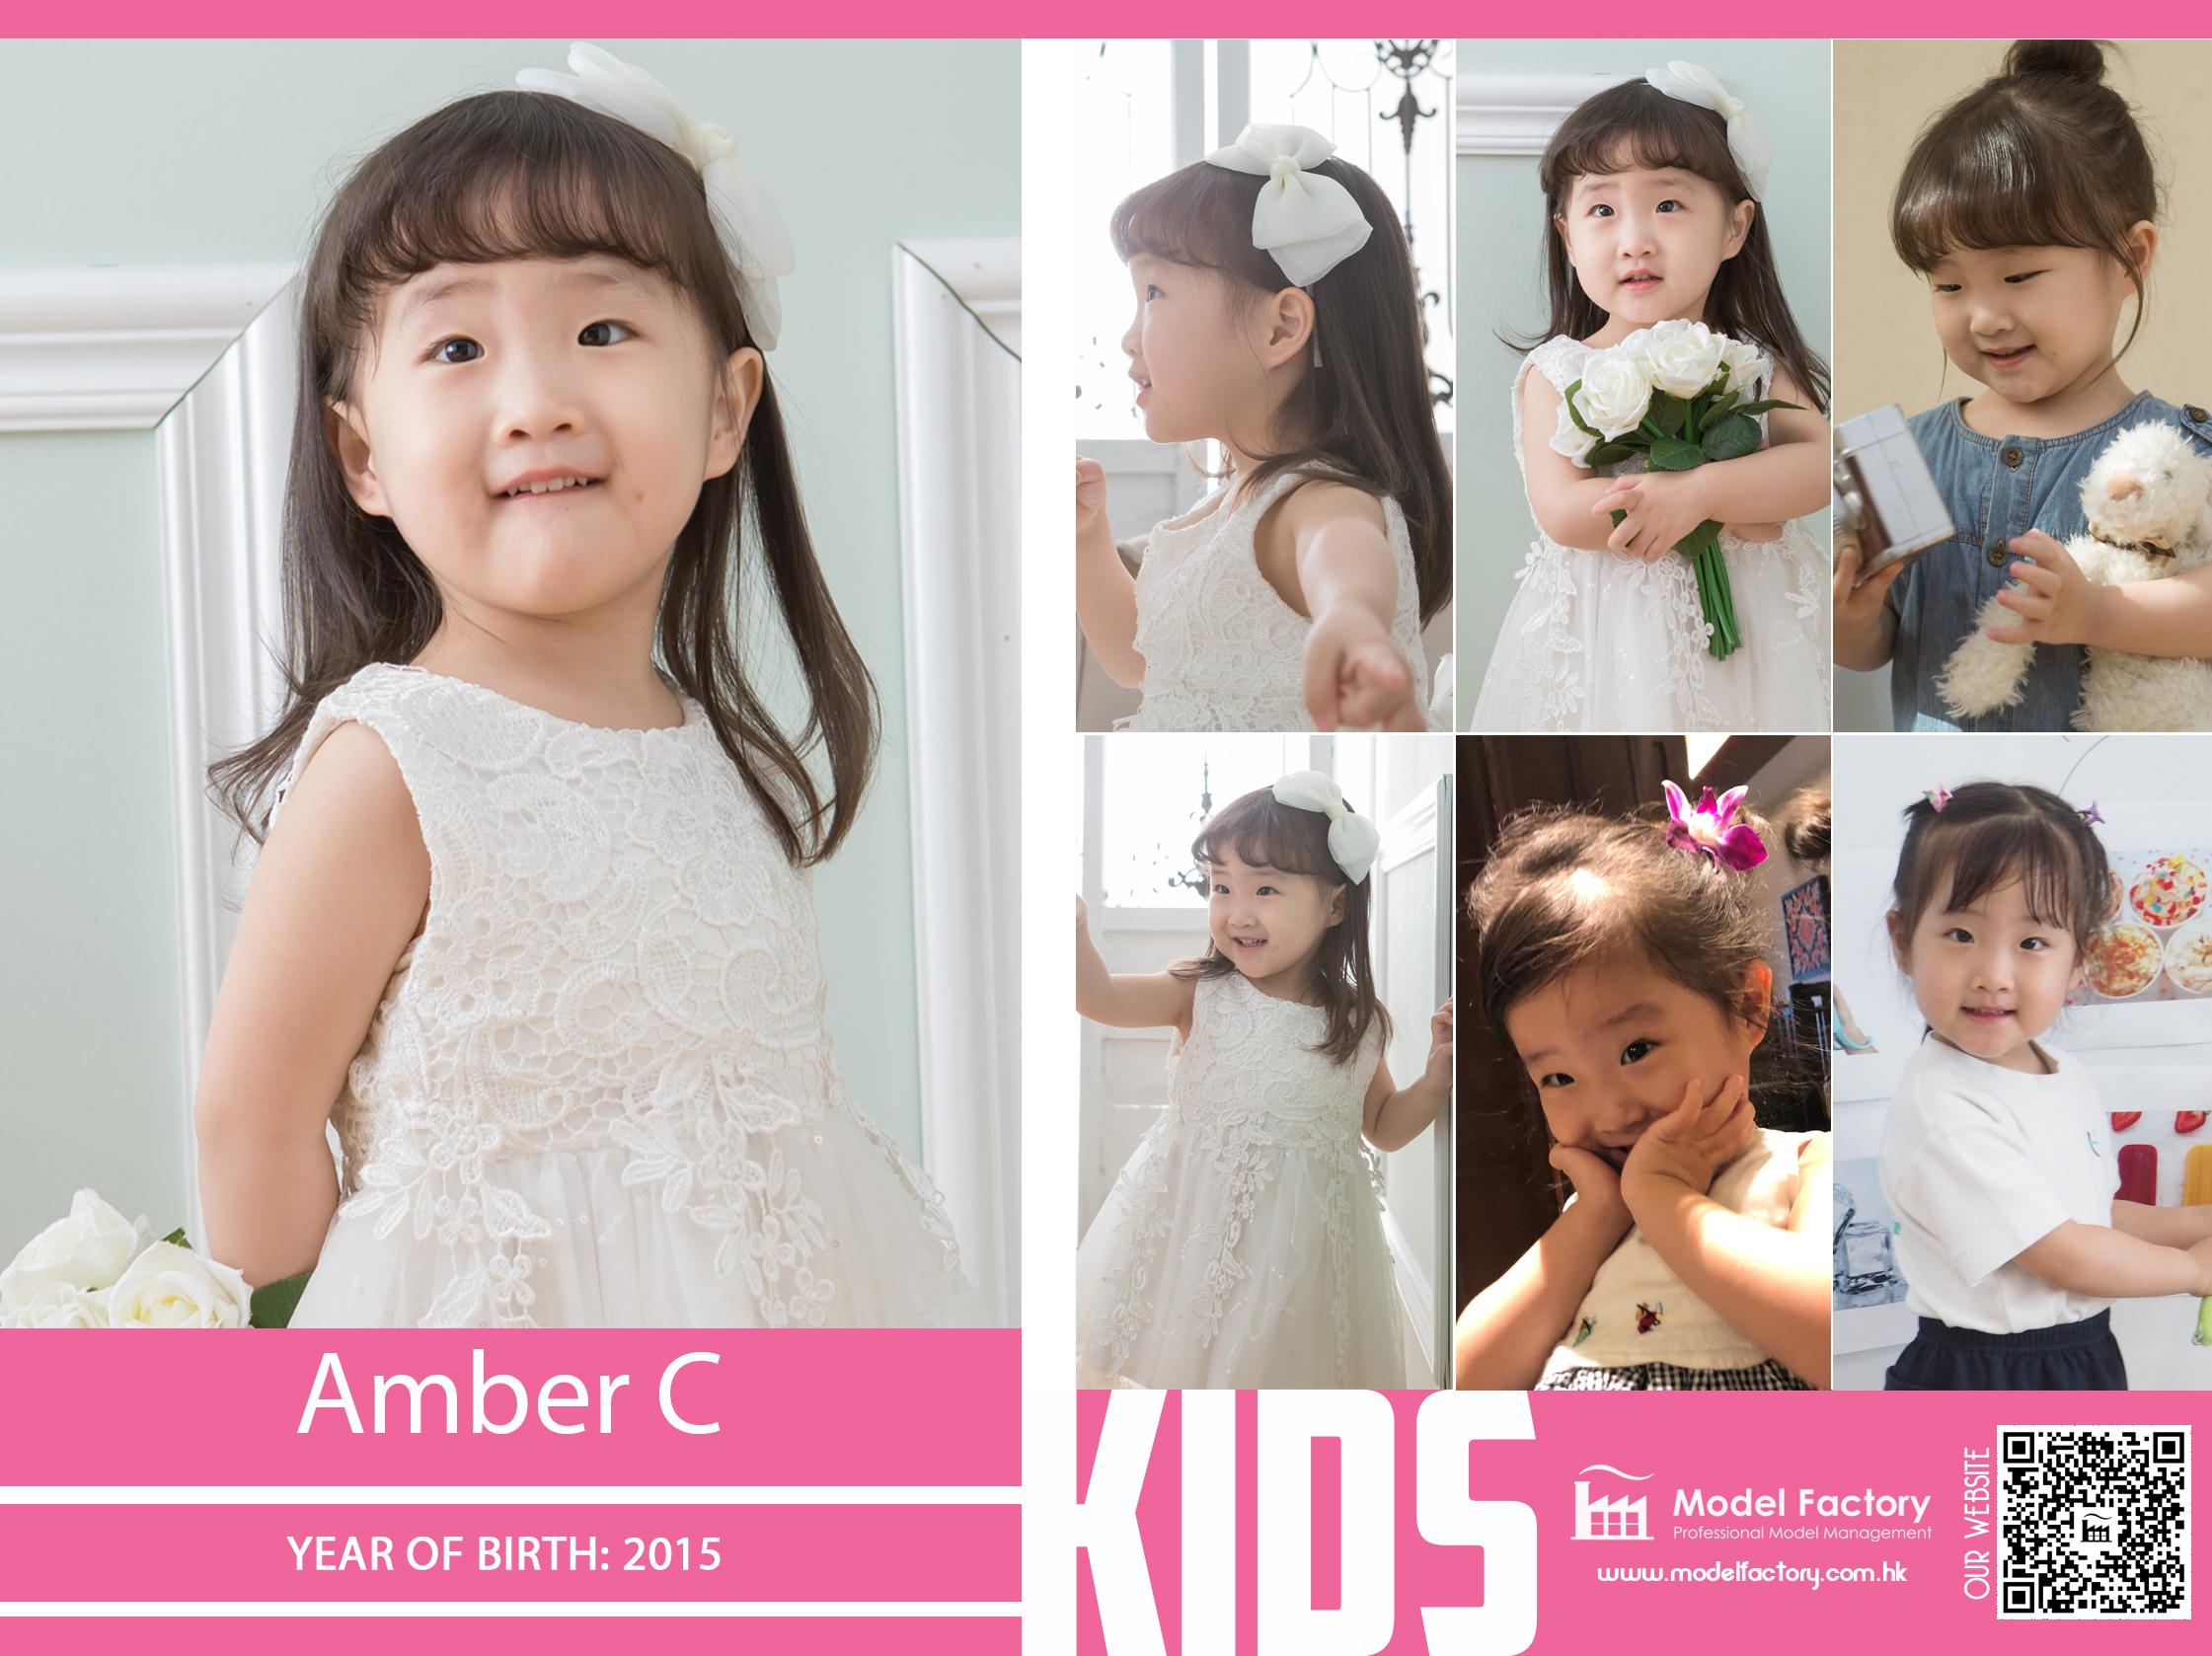 Model Factory Local Kids Model Amber C